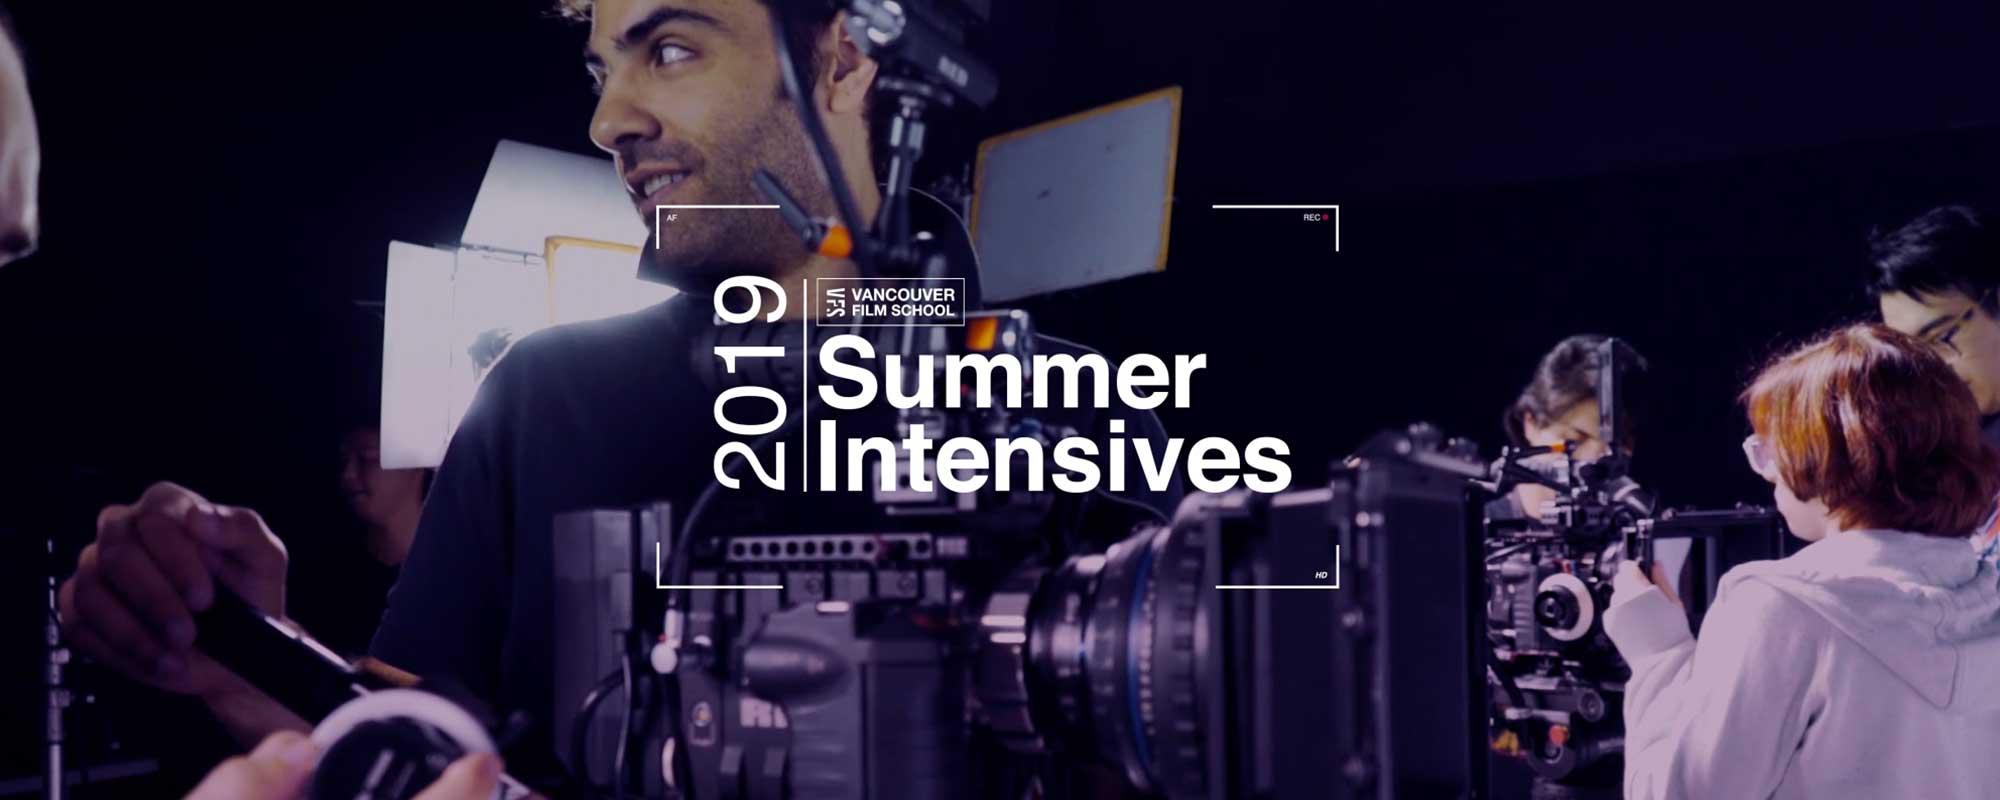 Summer Intensives 2019 | Vancouver Film School